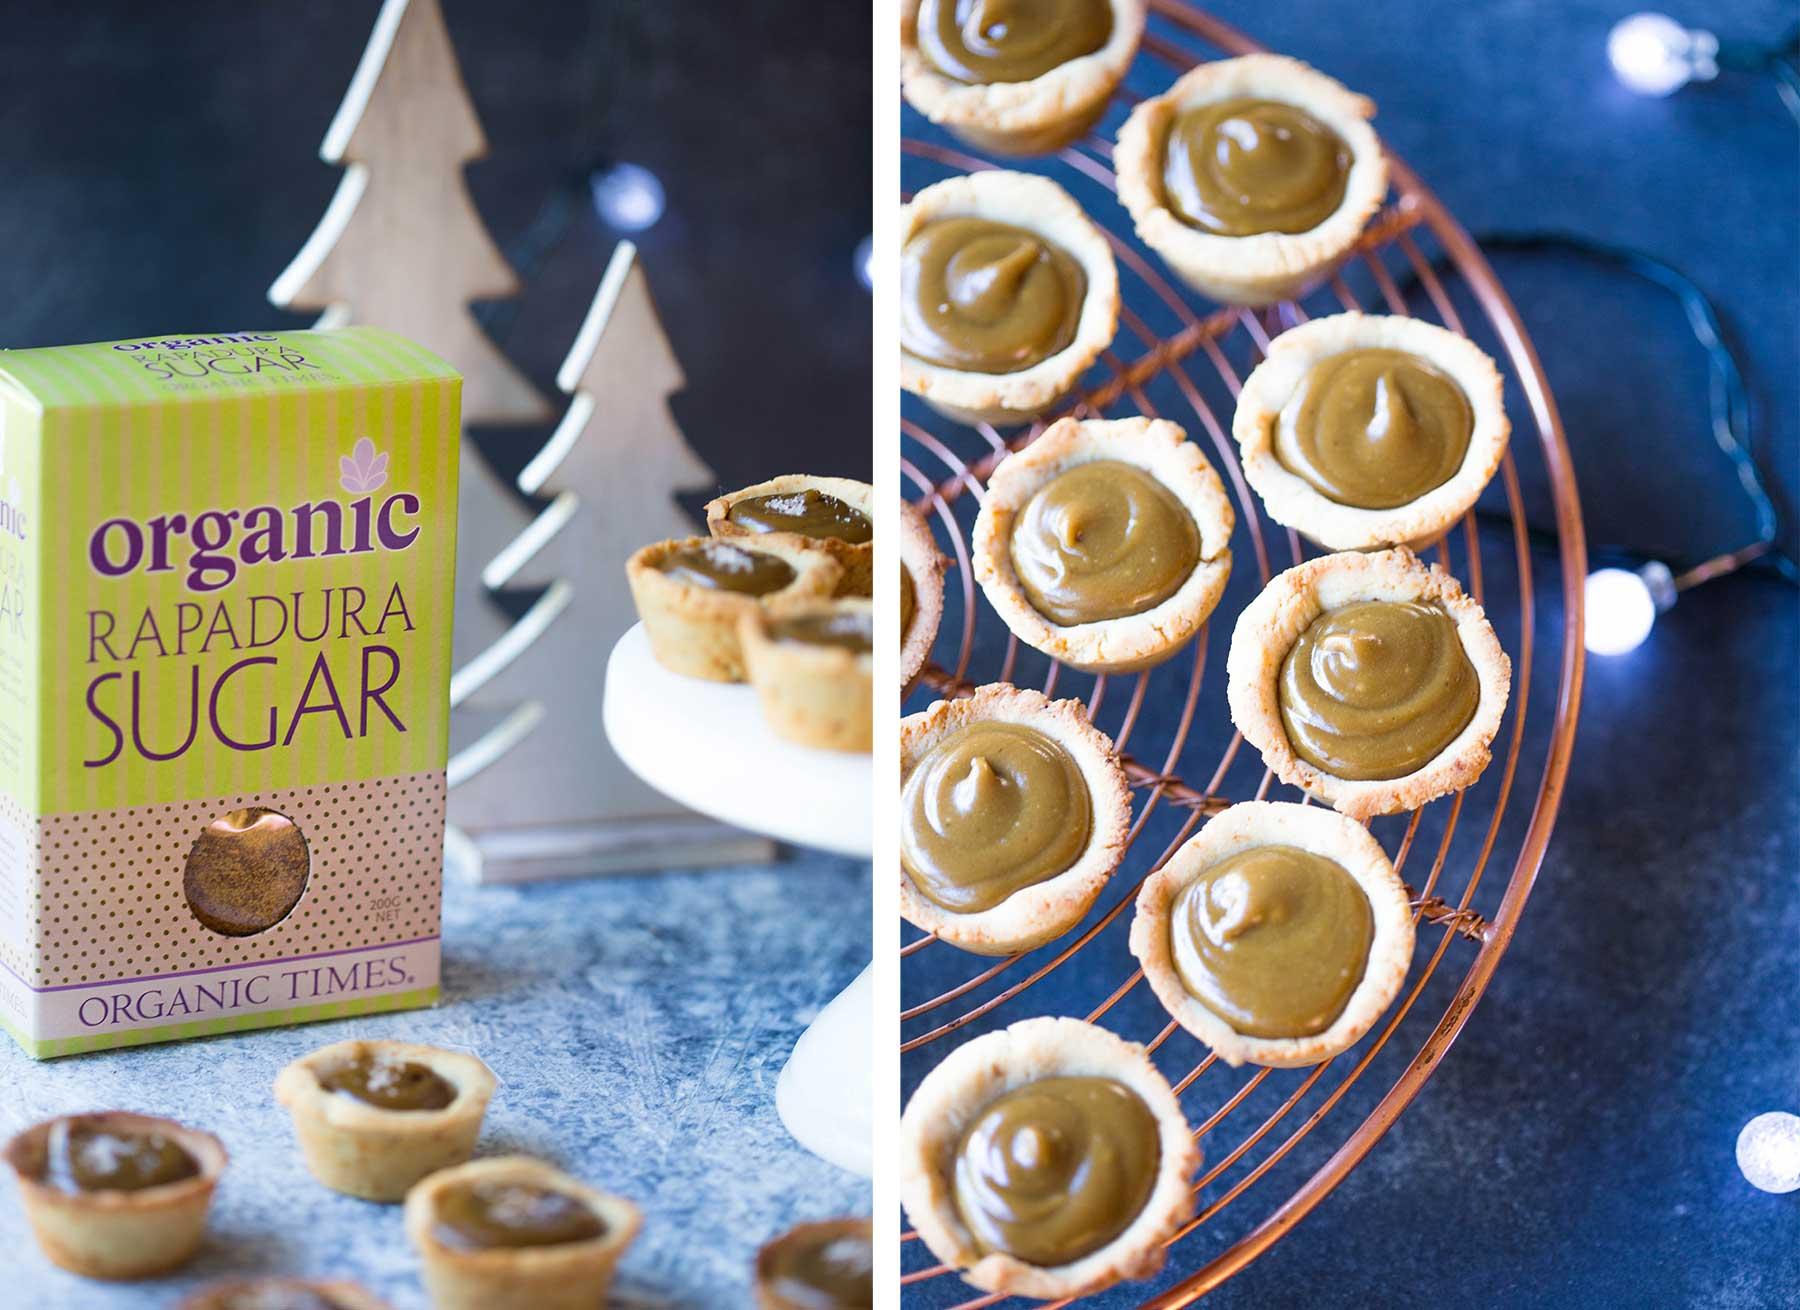 Salted caramel tarts on a cake stand next to Organic Times Rapadura Sugar box and Christmas decorations